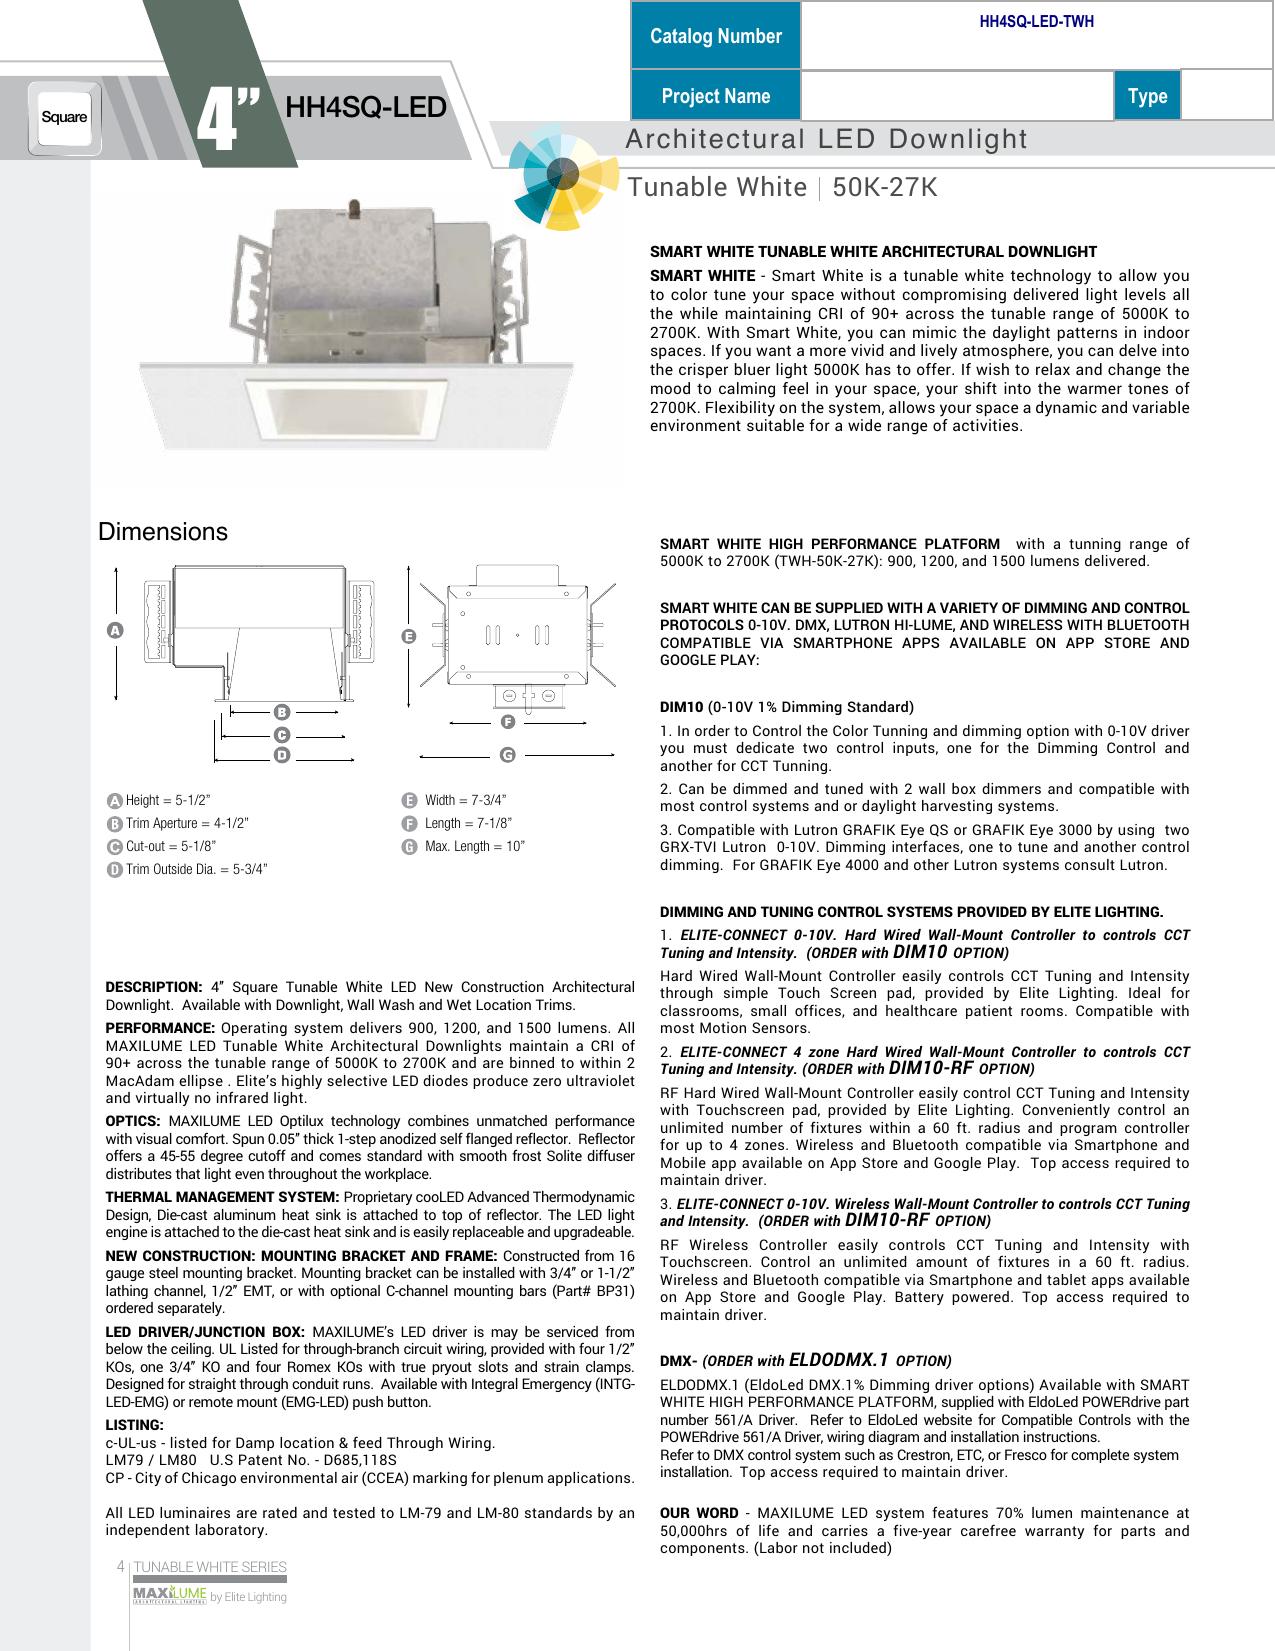 Hh4sq Led Elite Lighting Manualzz